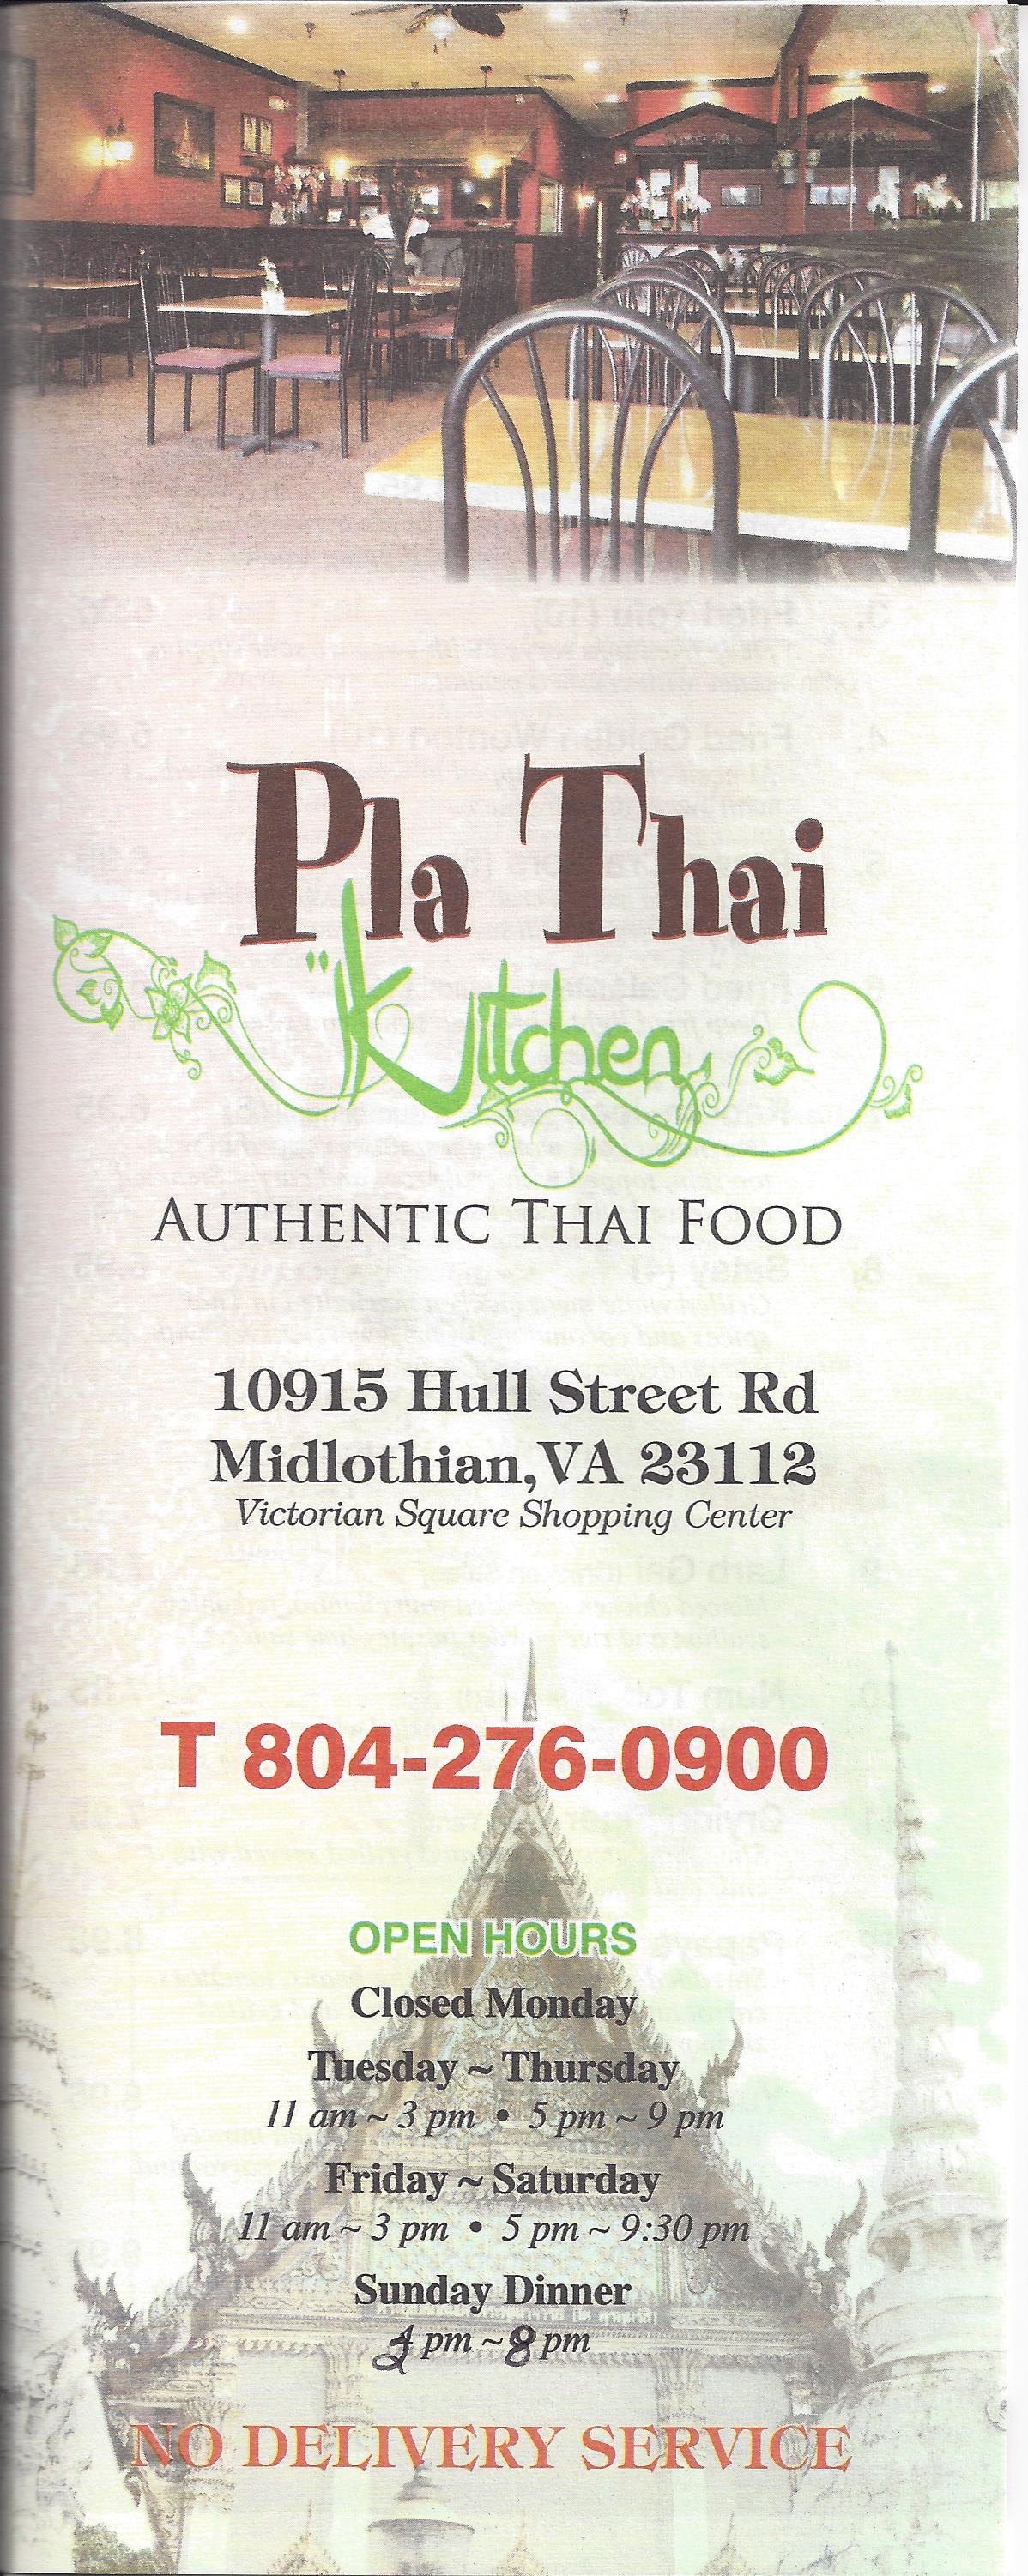 Pla Thai Kitchen Menu, Menu for Pla Thai Kitchen, Midlothian ...